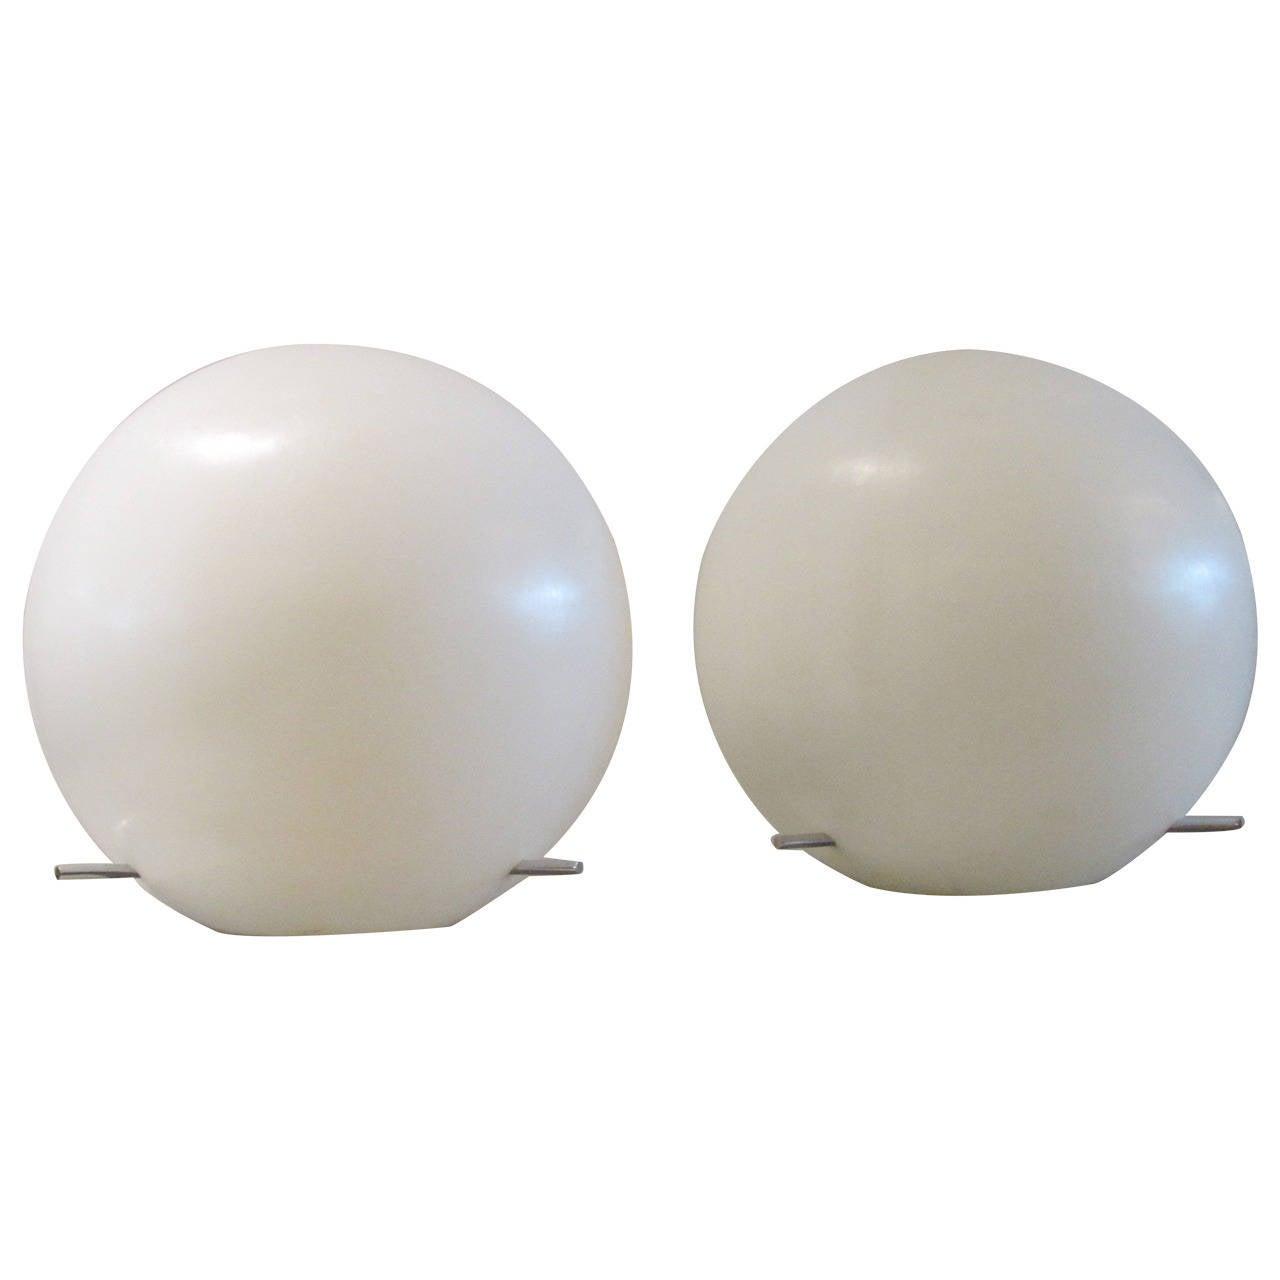 Paul Mayen Globe Lamps For Habitat Inc. For Sale